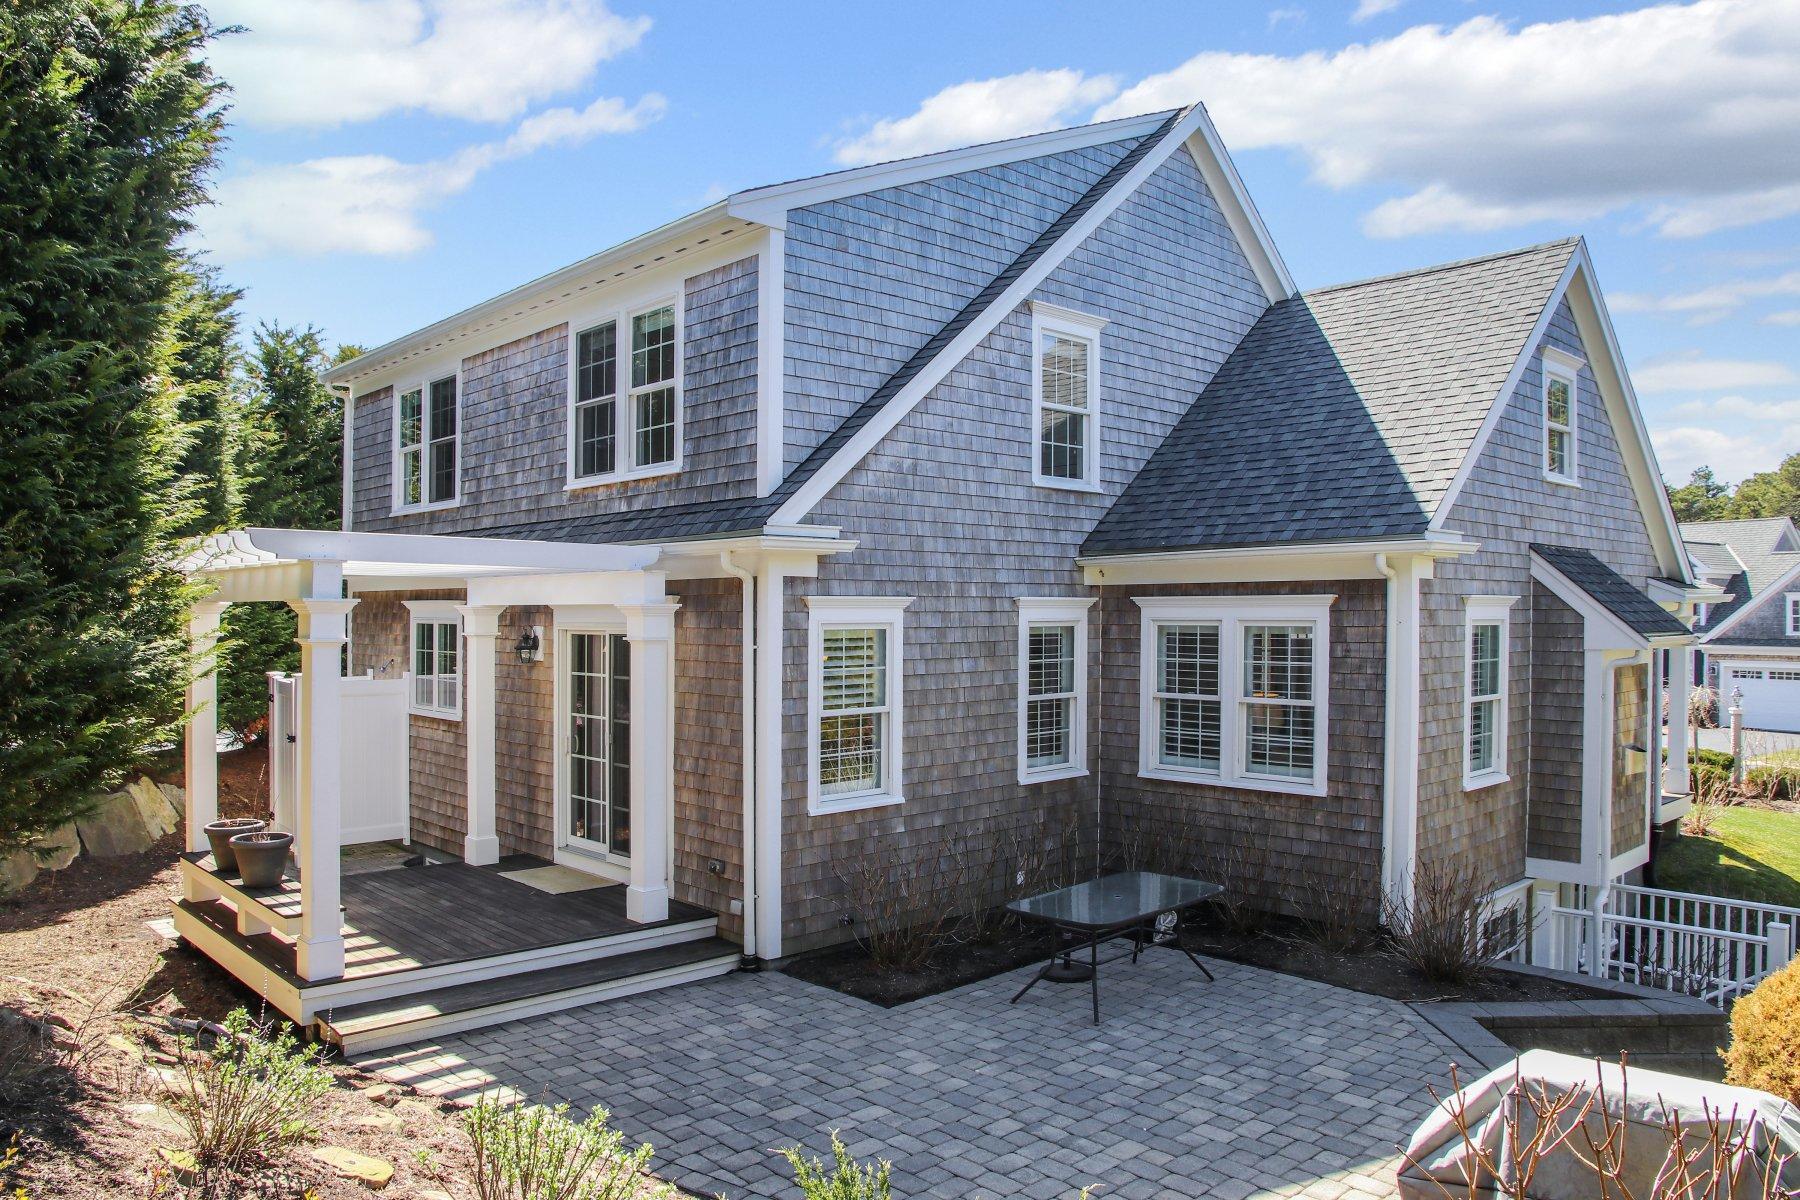 10 Seacrest Village Lane, Chatham MA, 02633